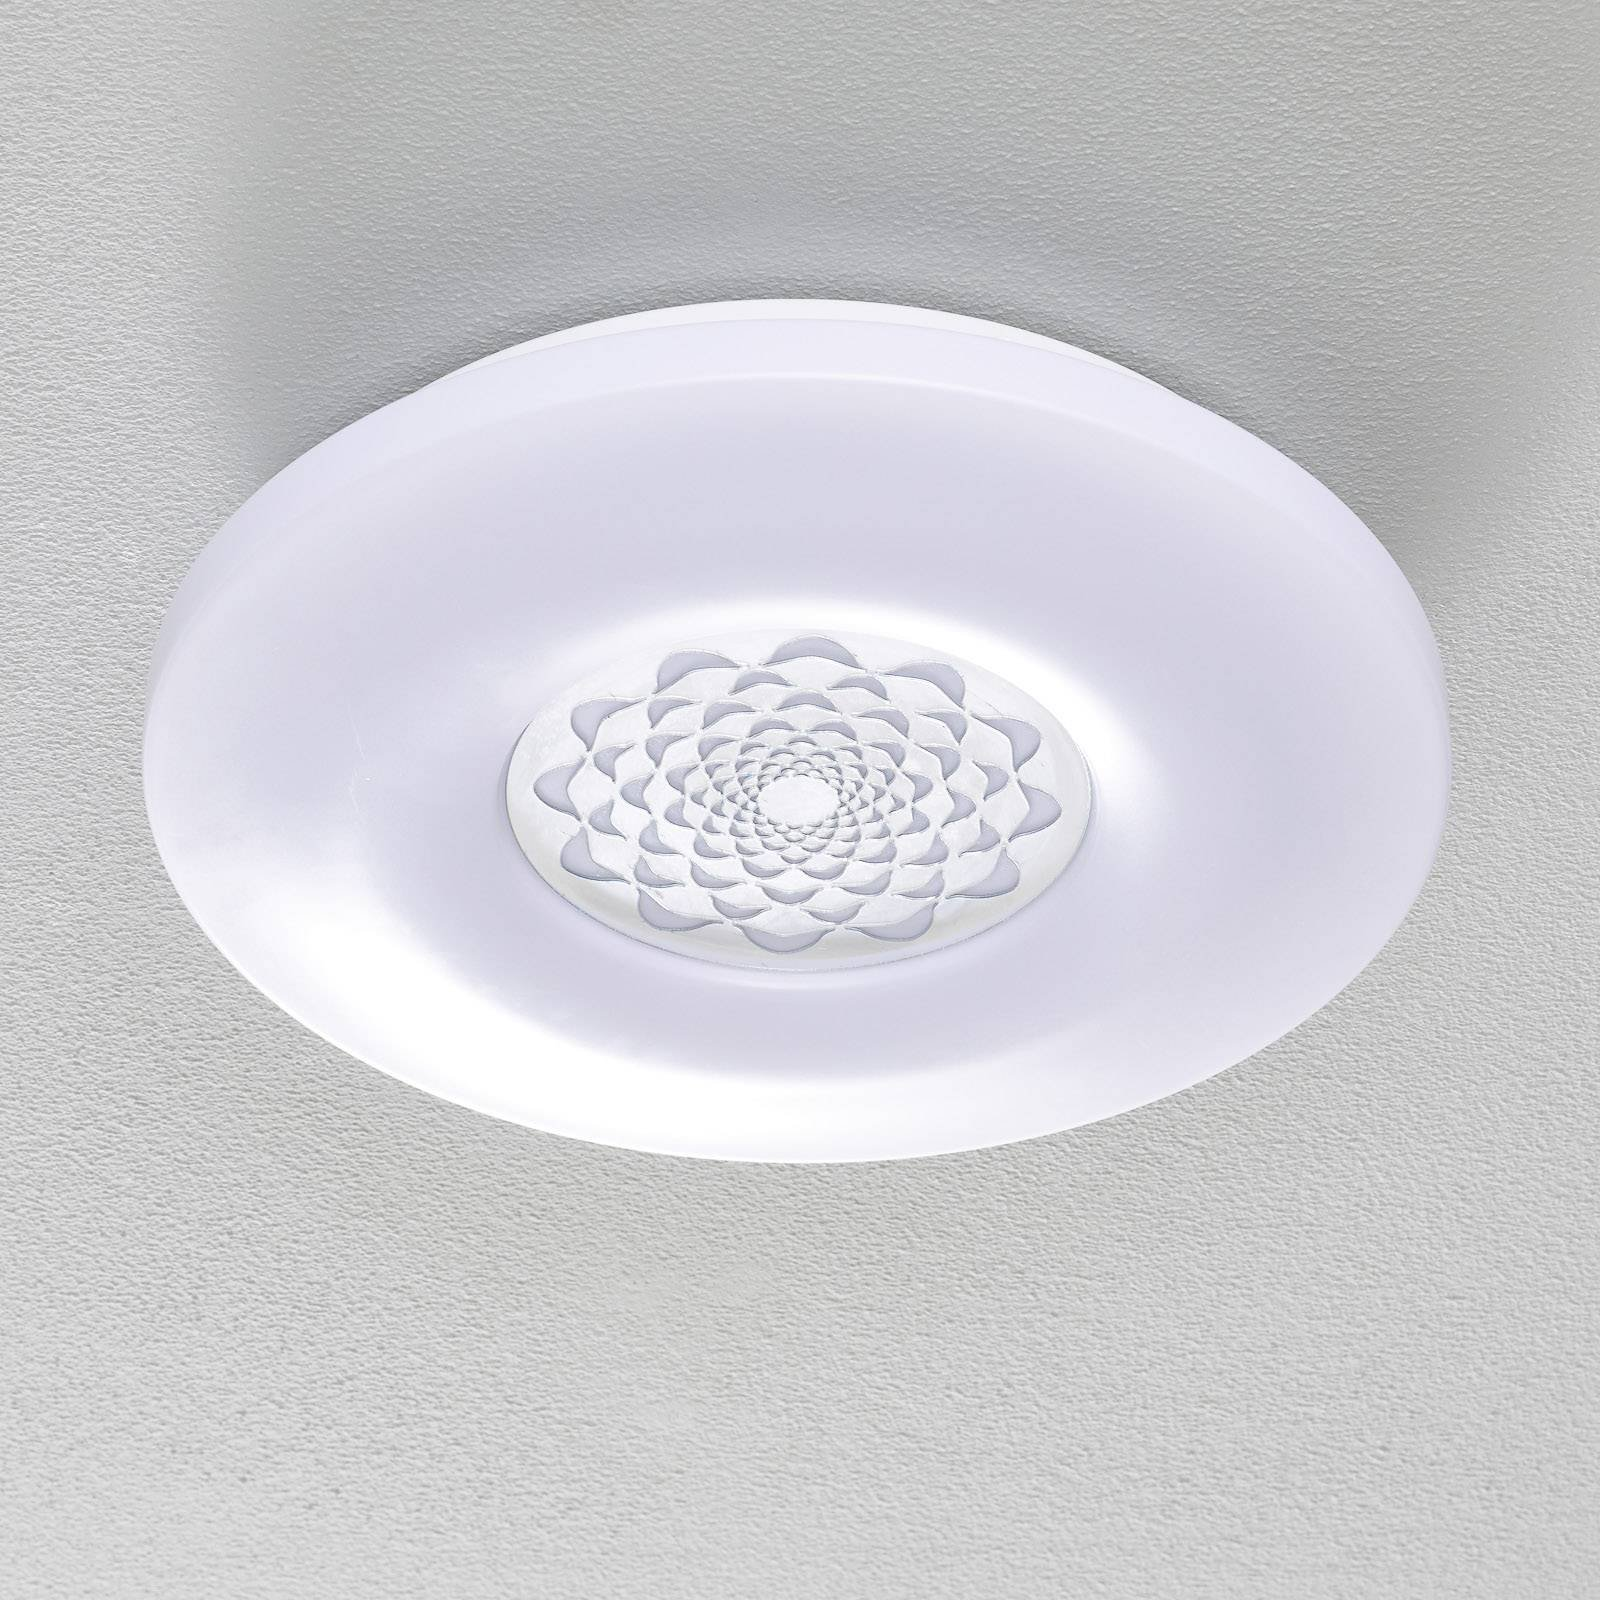 EGLO connect Capasso-C LED-taklampe med motiv